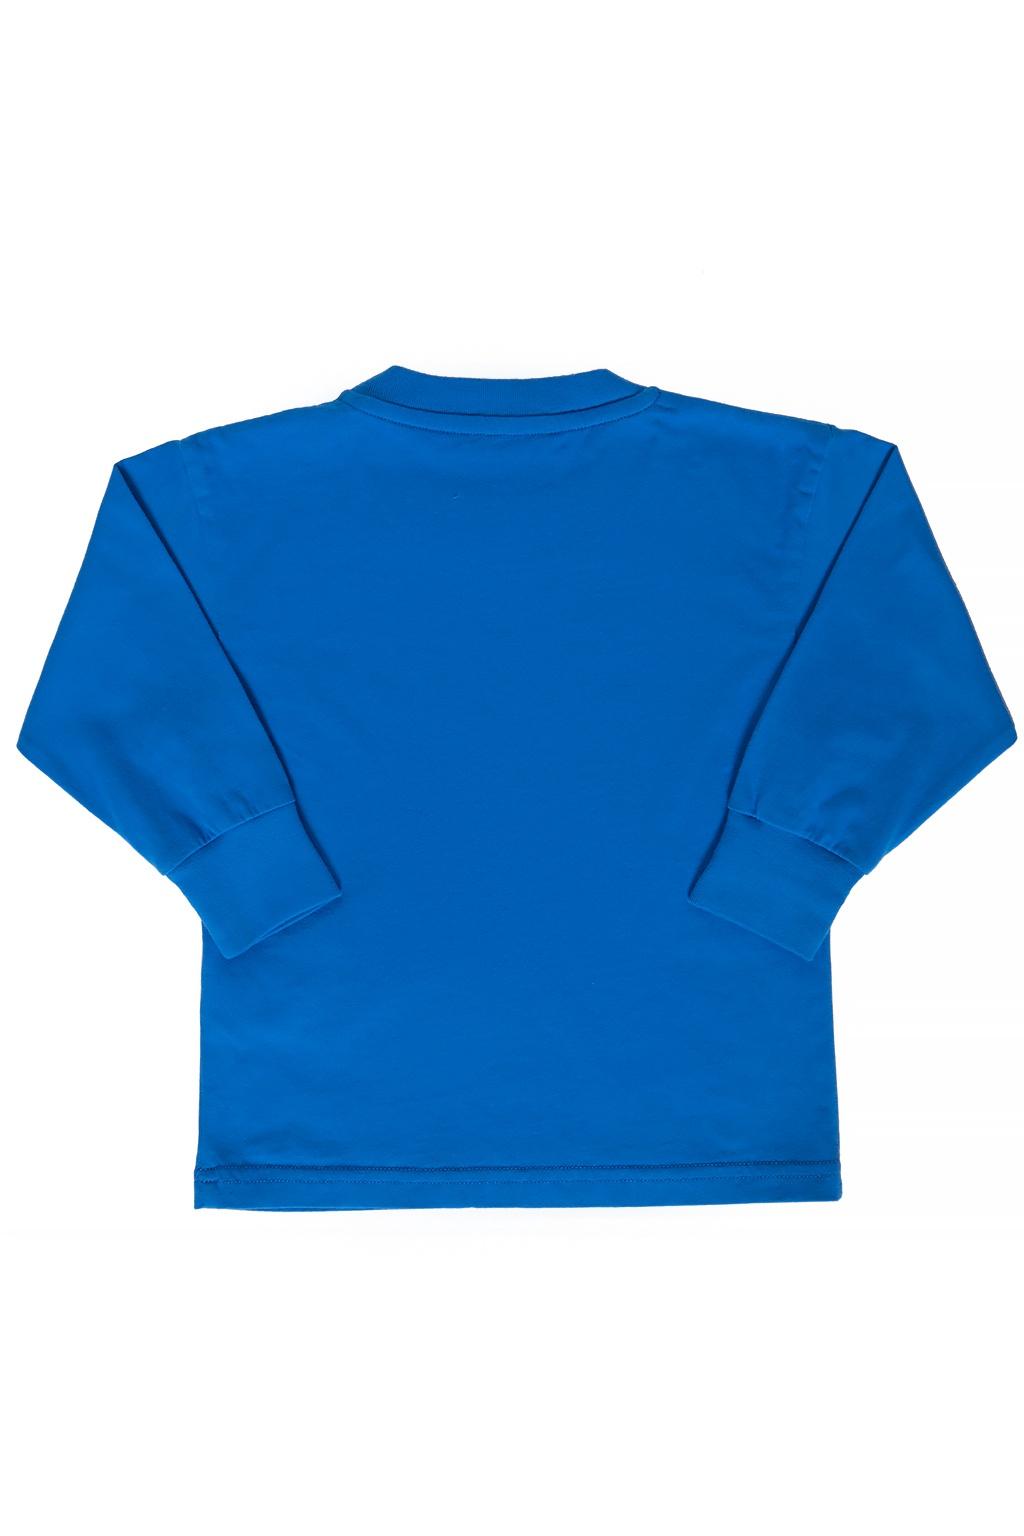 Balenciaga Kids T-shirt with logo